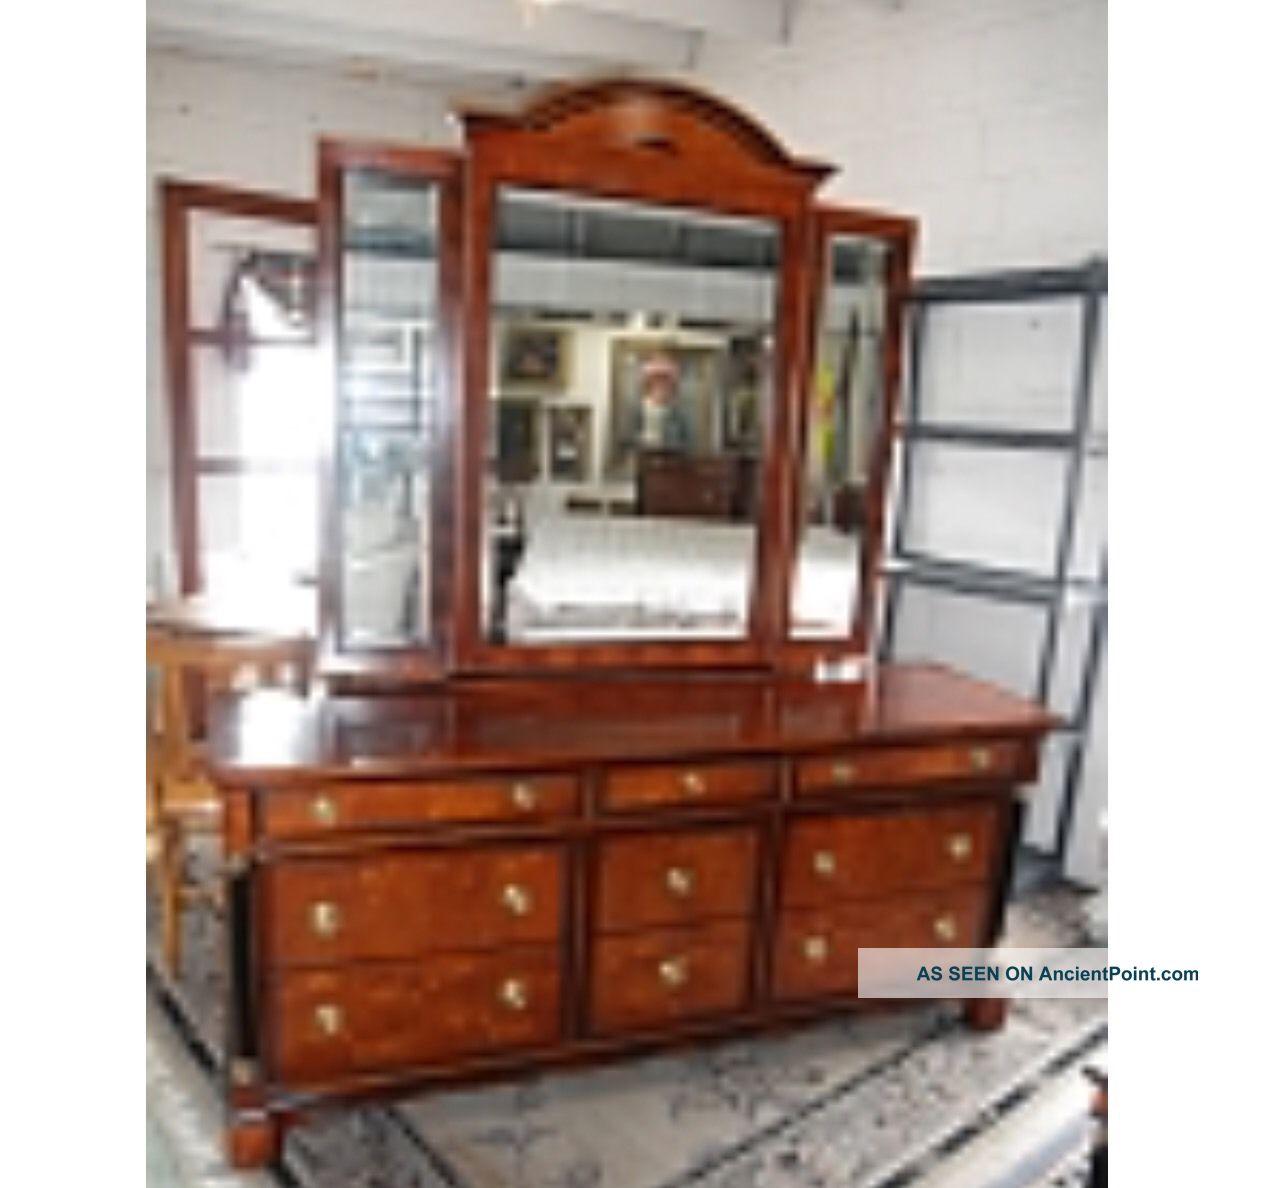 Century Furniture Capuan Biedermeier Style Triptych Mirror Dresser By R Sobota Post-1950 photo